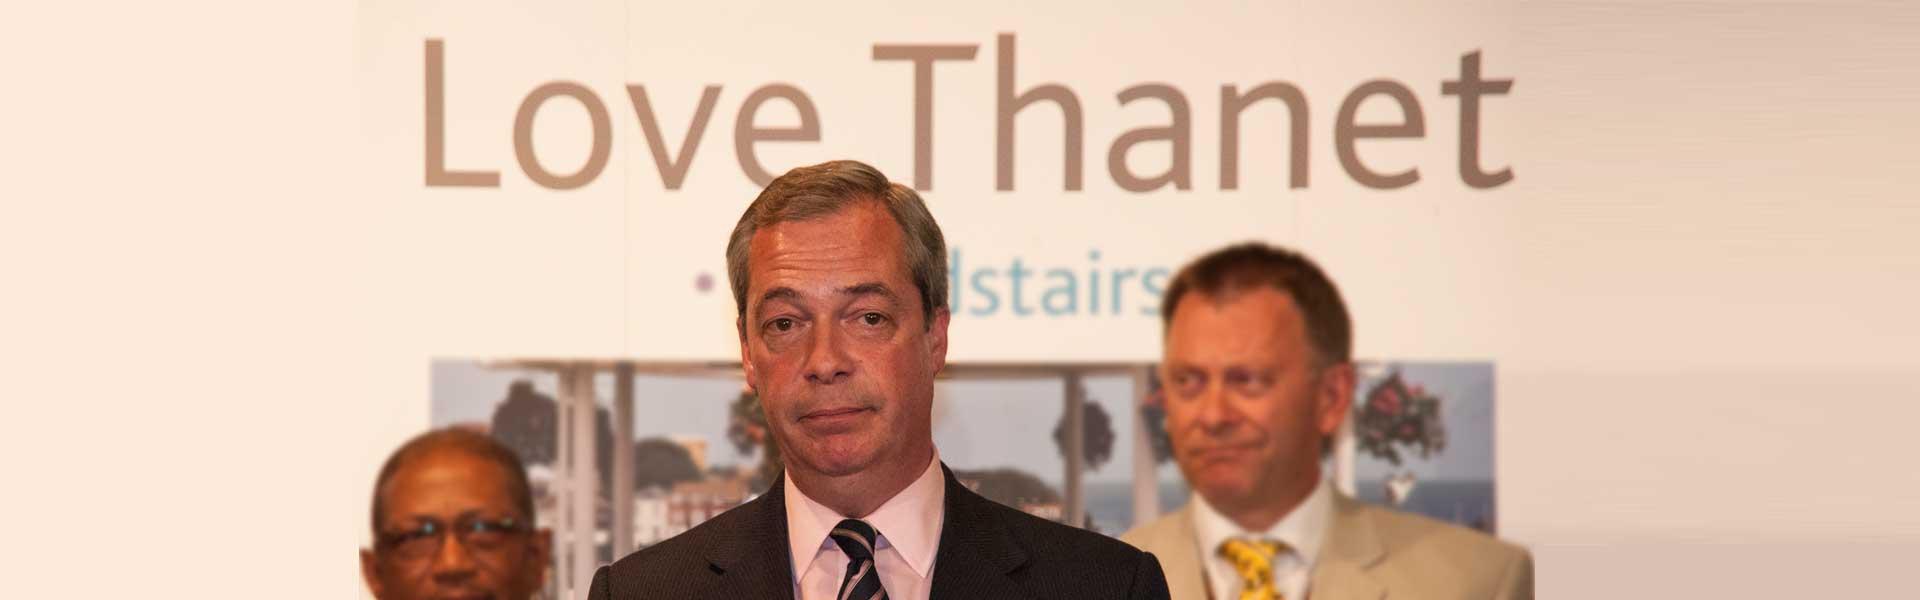 Nigel Farage loses in 2015